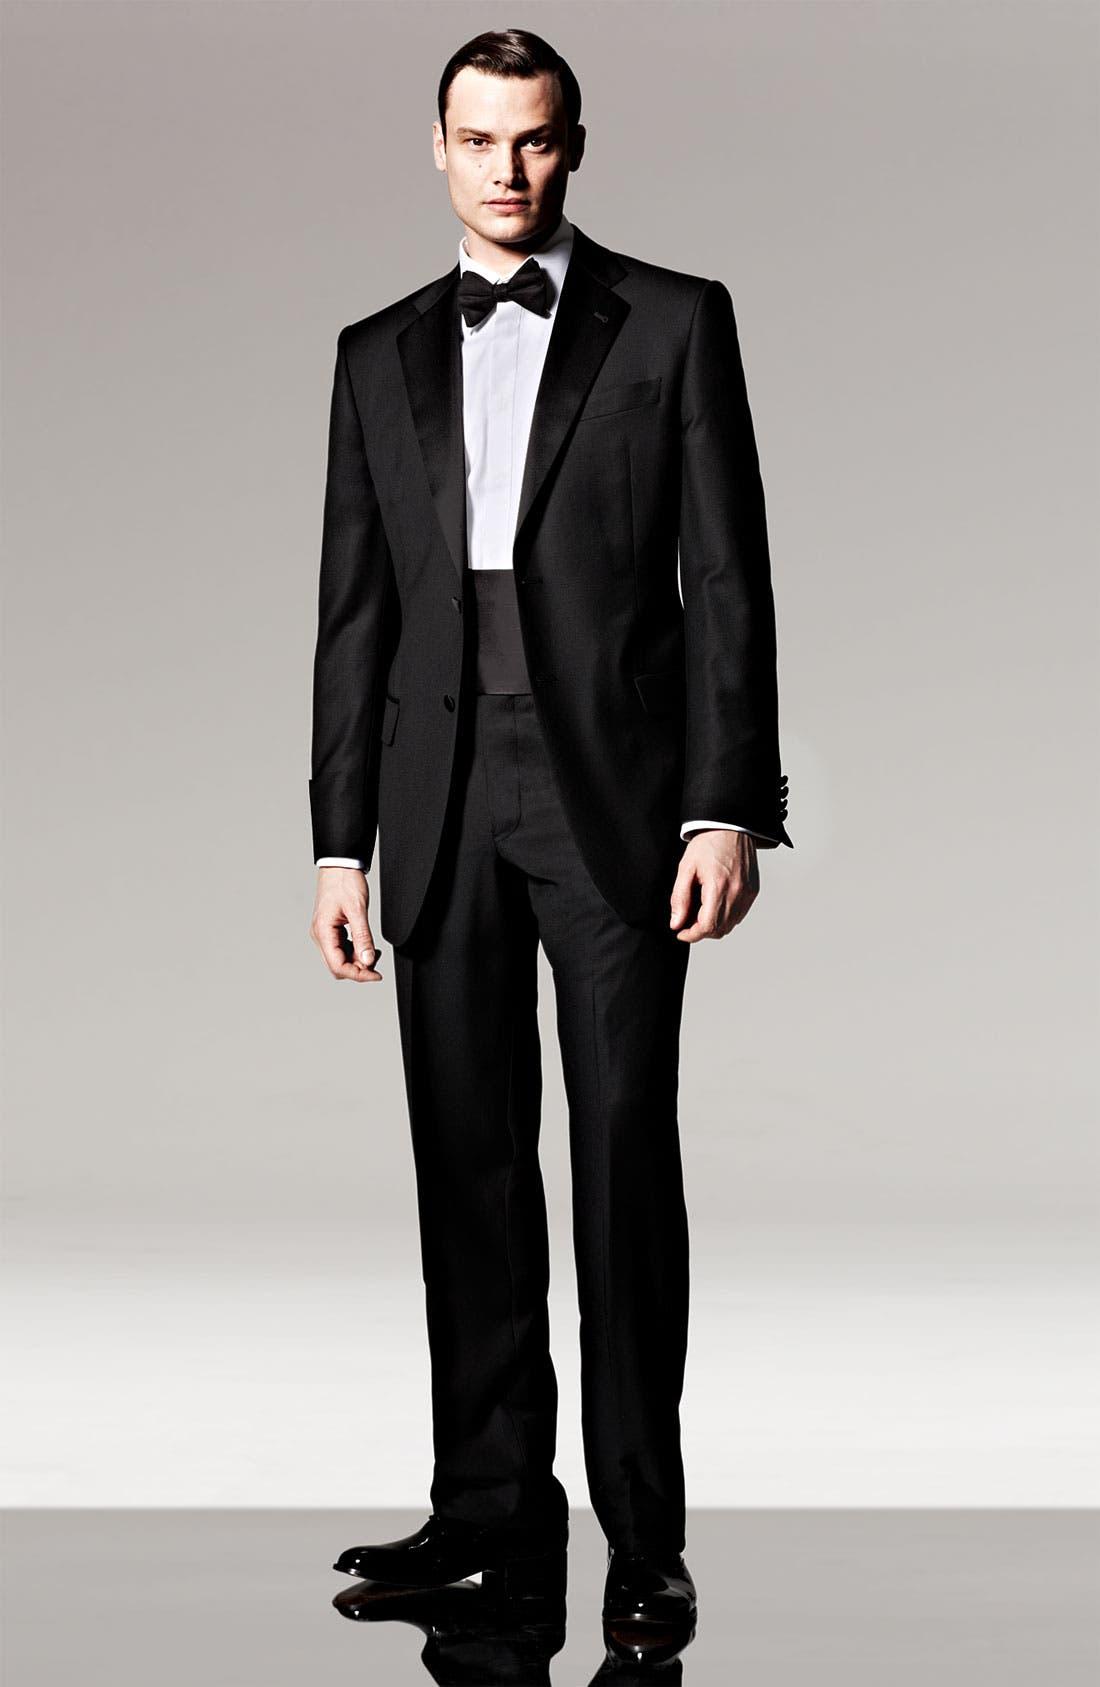 Alternate Image 1 Selected - Joseph Abboud Super 120s Wool Tuxedo & David Donahue French Cuff Tuxedo Shirt